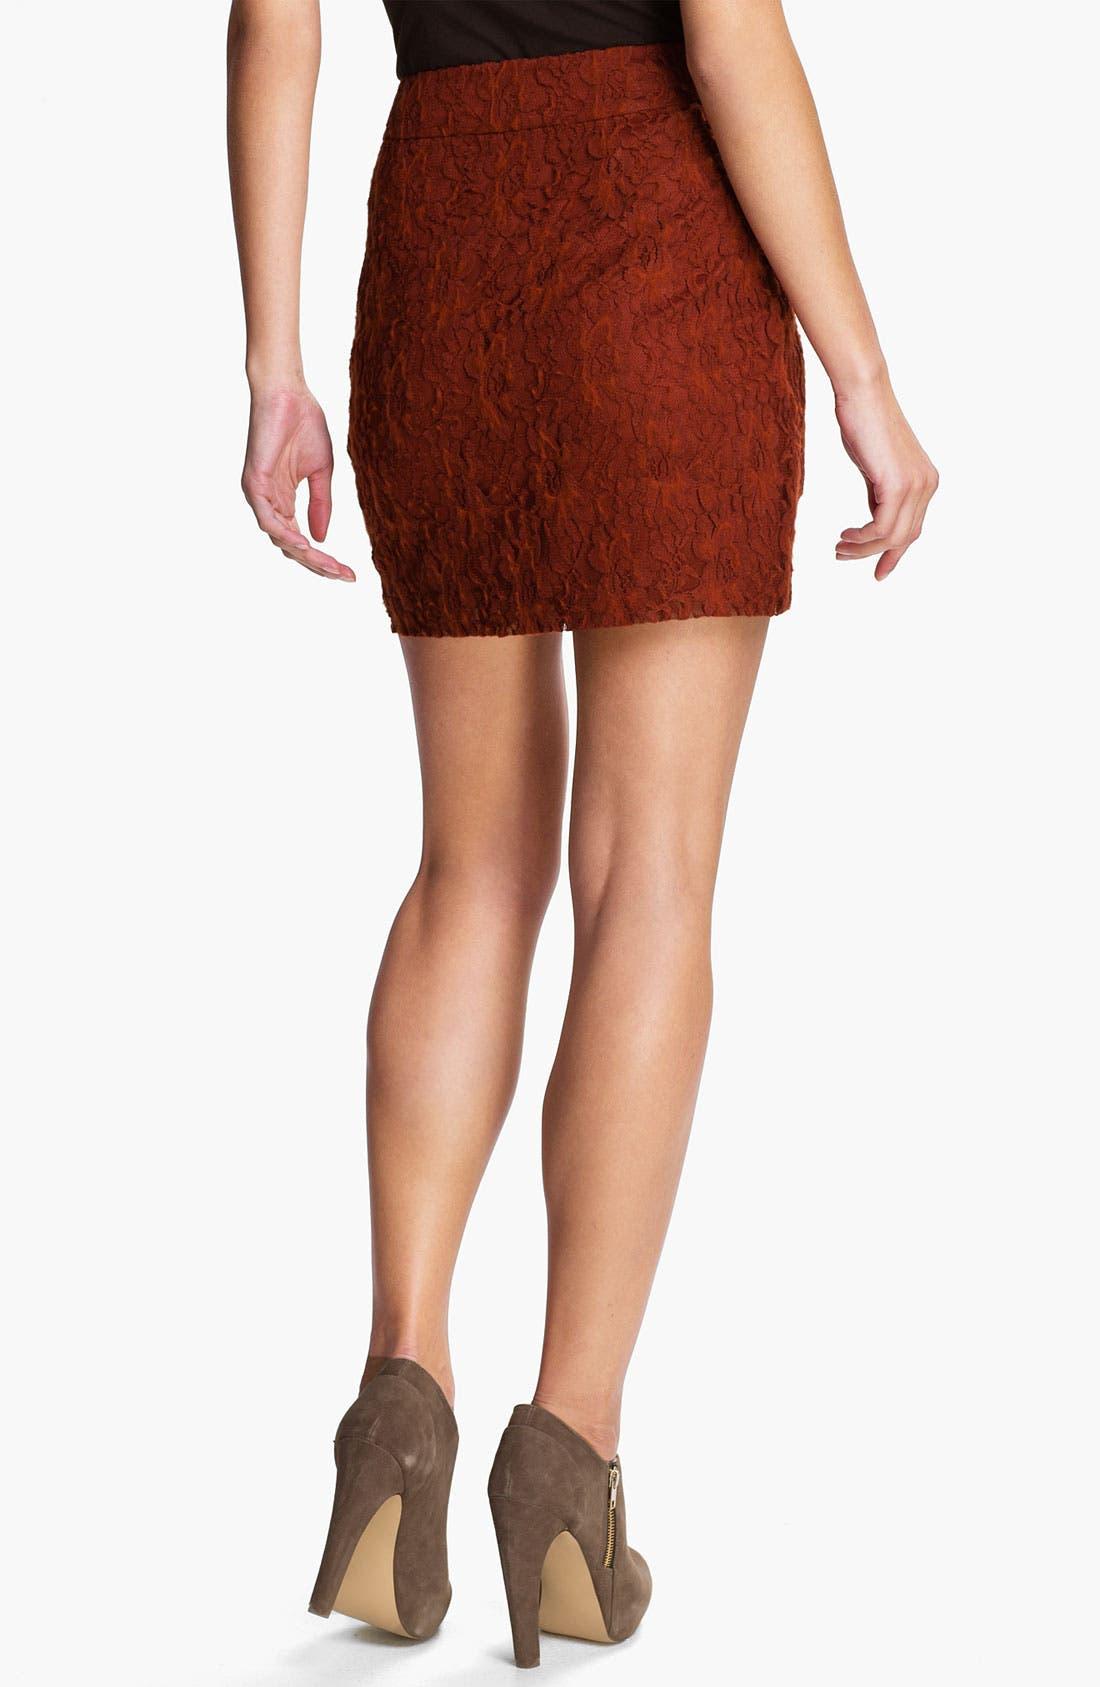 Alternate Image 2  - Kensie 'Fuzzy Lace' Skirt (Online Exclusive)